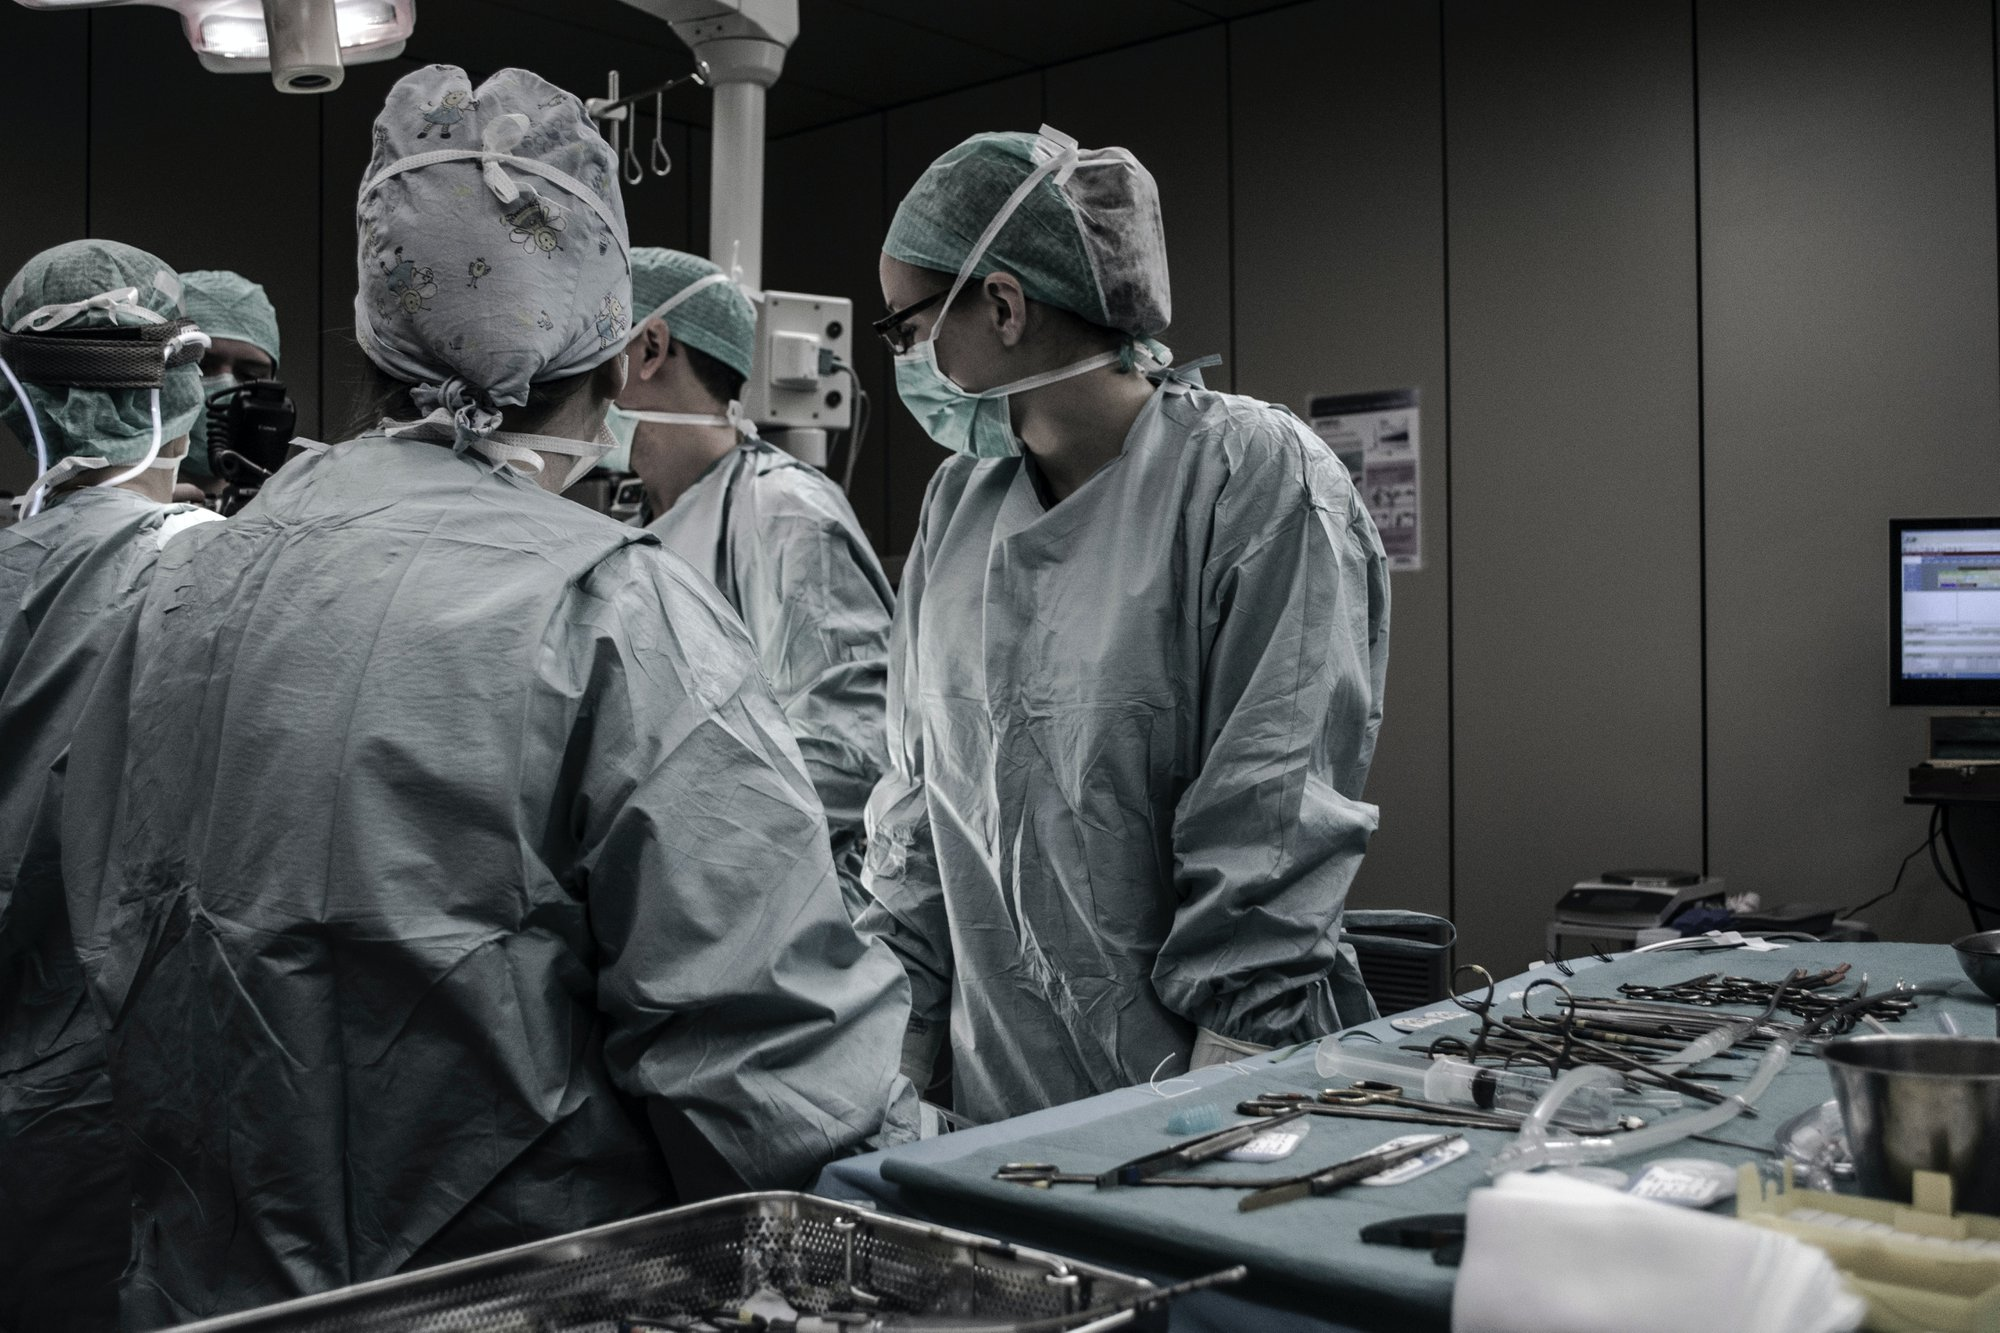 Dubai Lifestyle: The Innovative Healthcare System